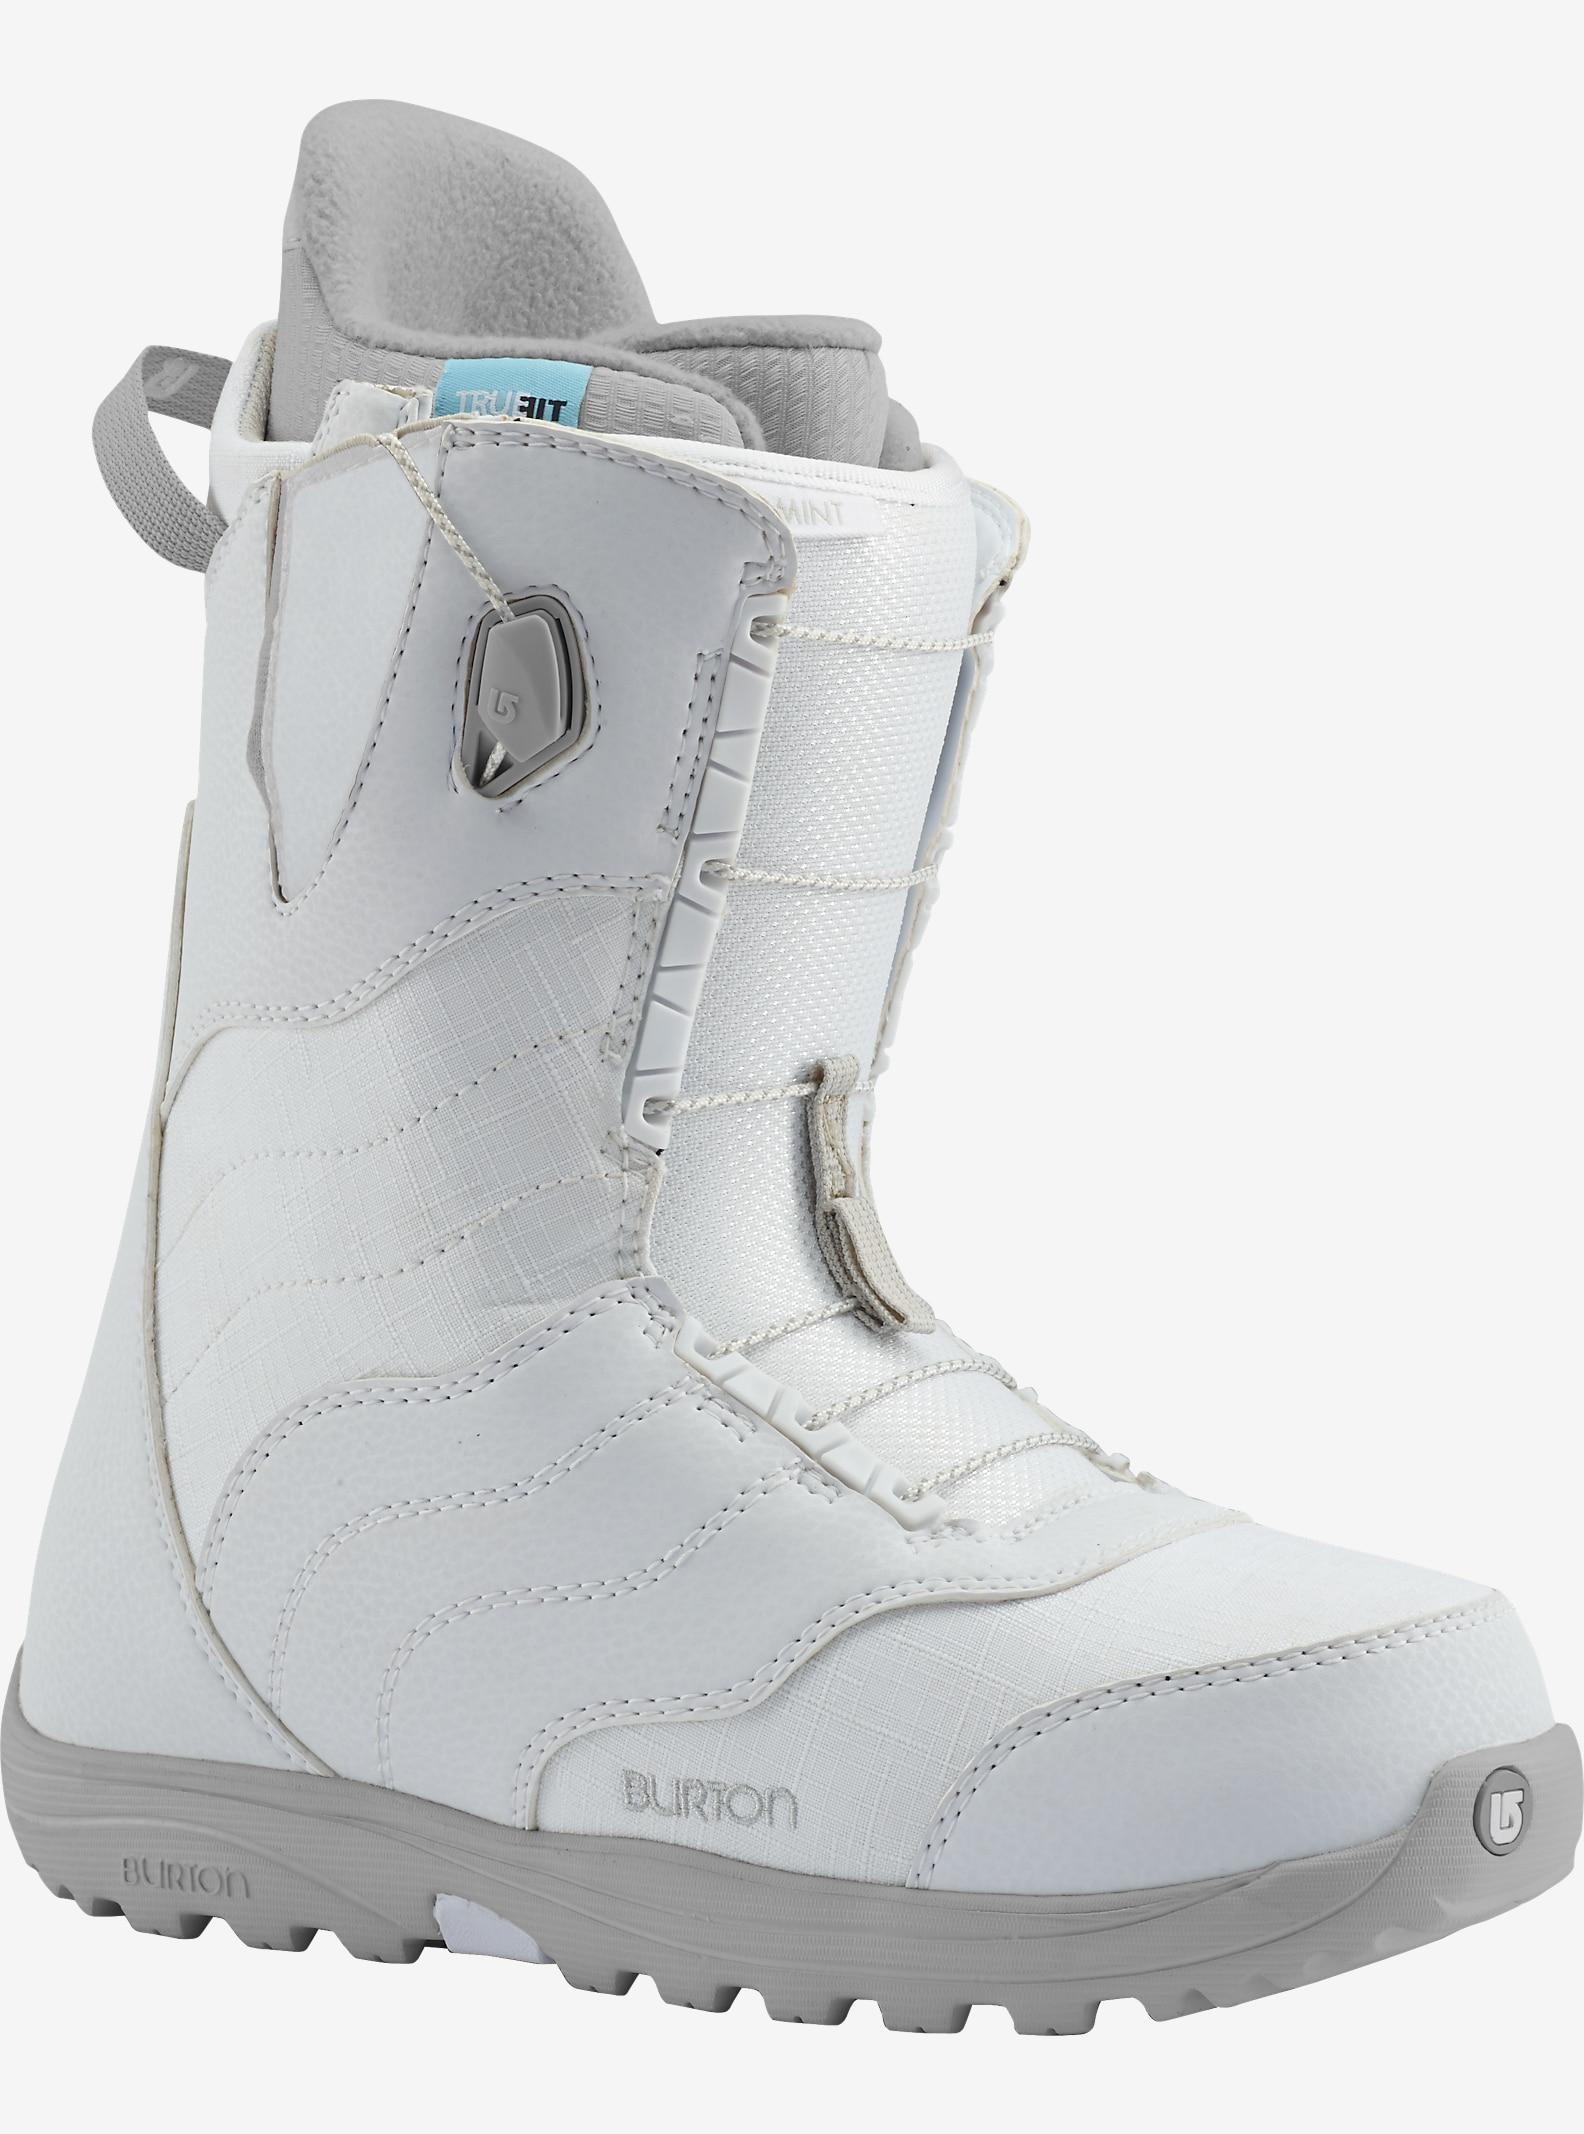 Burton Mint Snowboard Boot shown in White / Gray